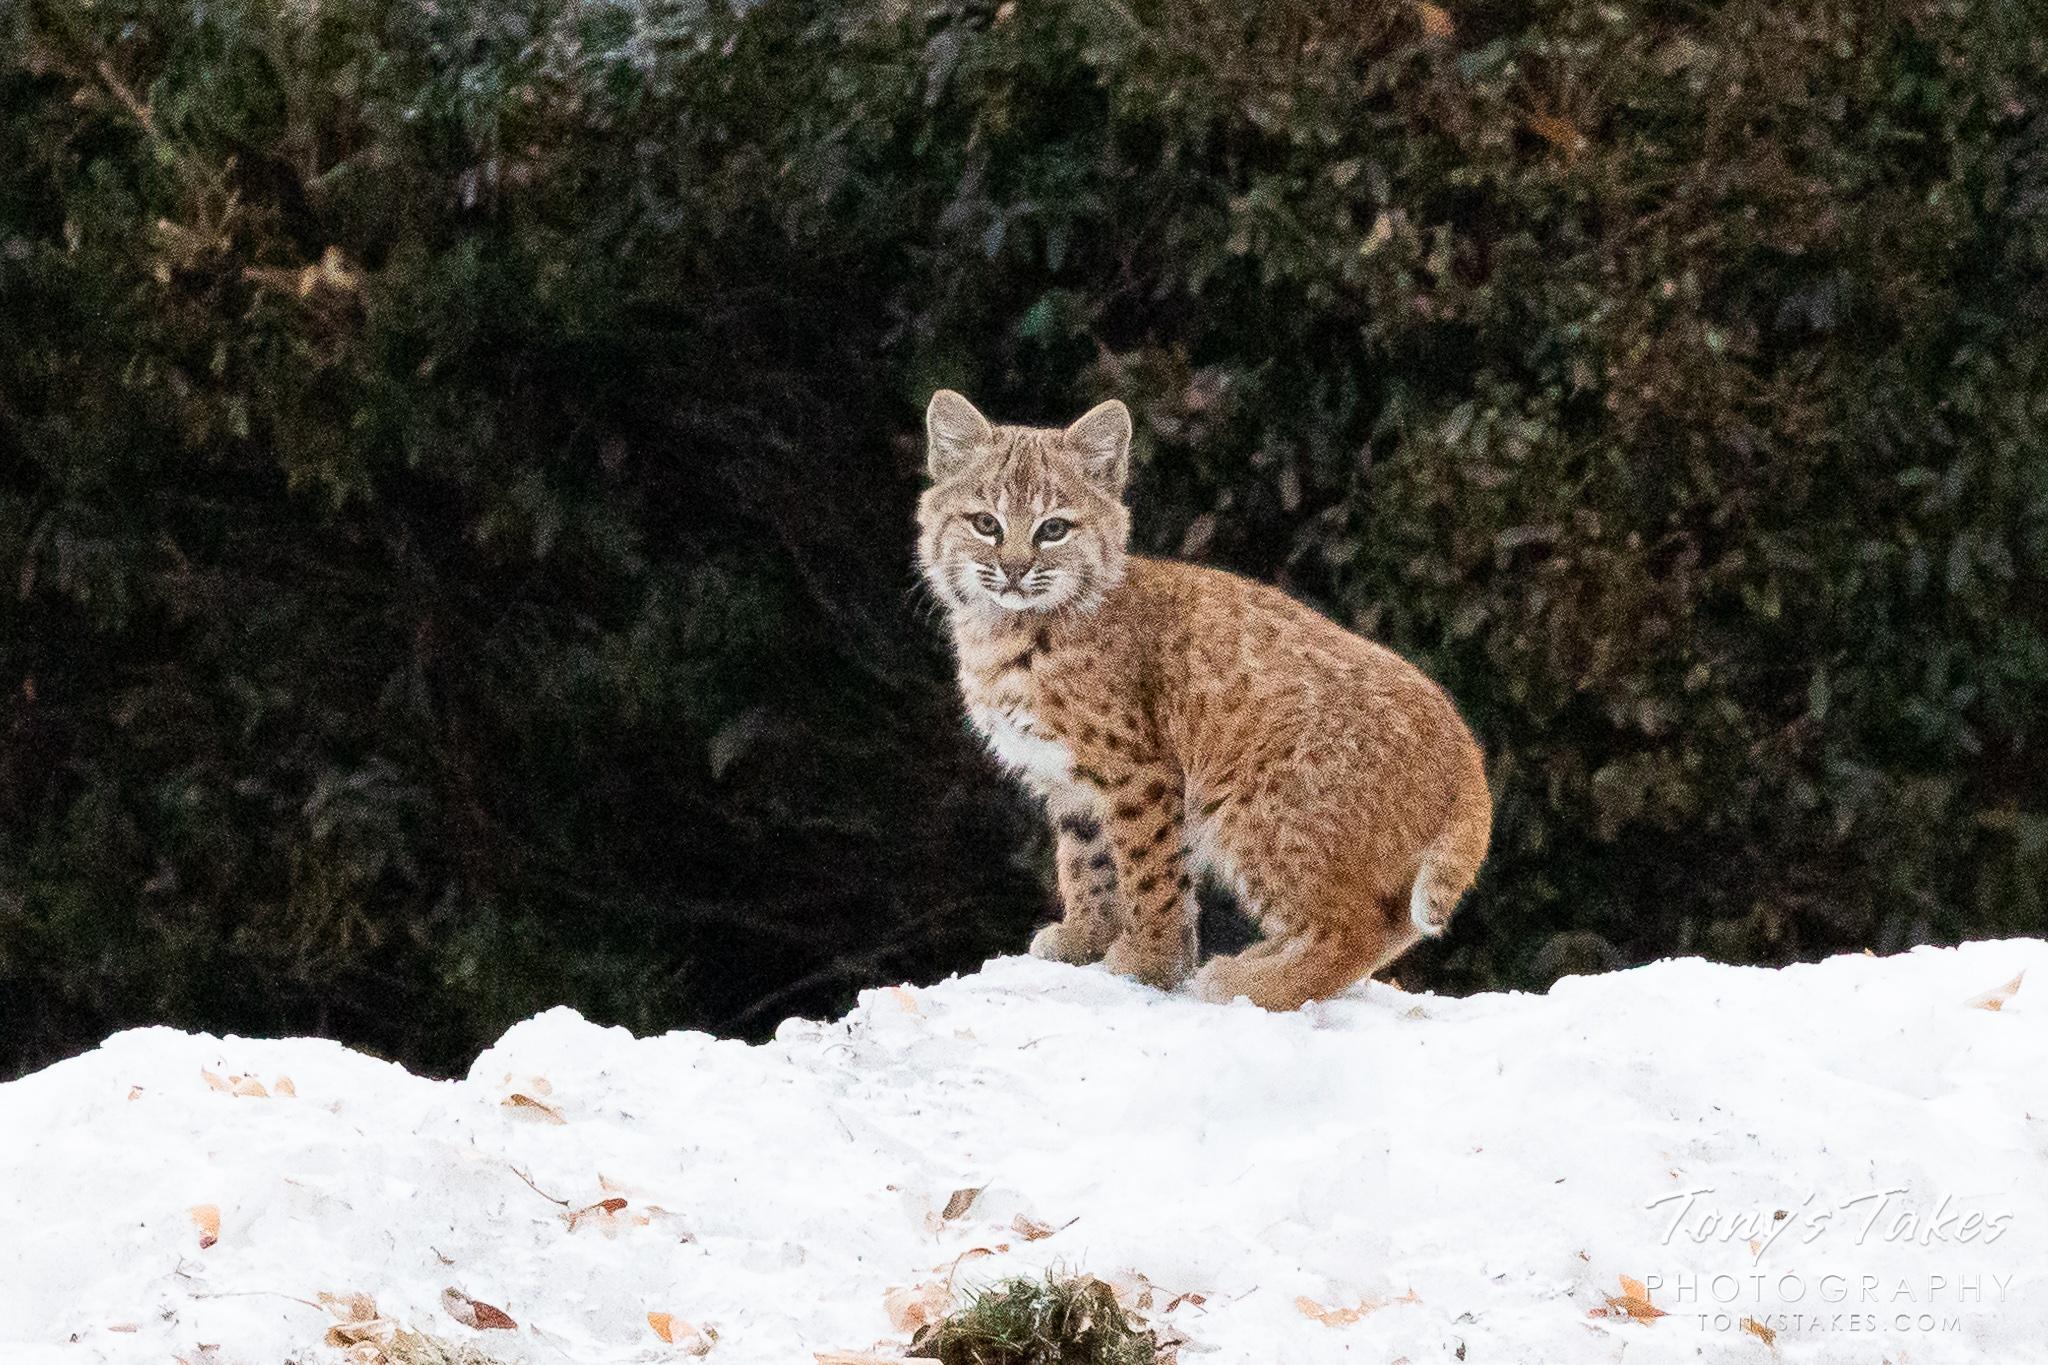 Video slideshow: Top shots 2020 – Wildlife